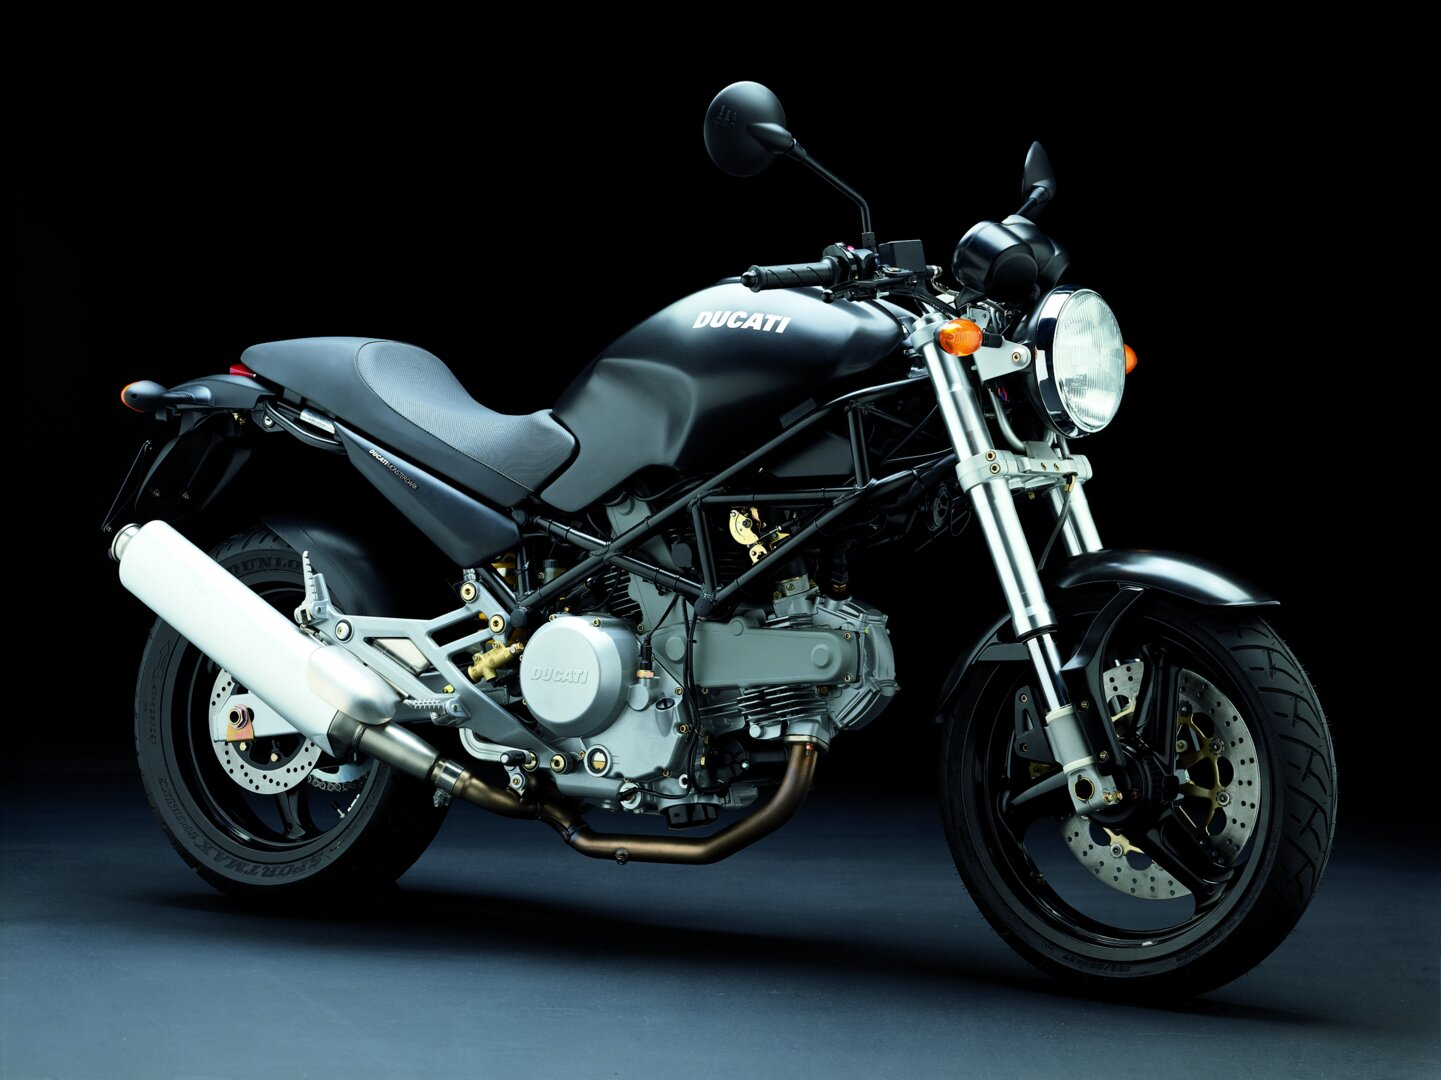 Moto del día: Ducati Monster 620 i.e.